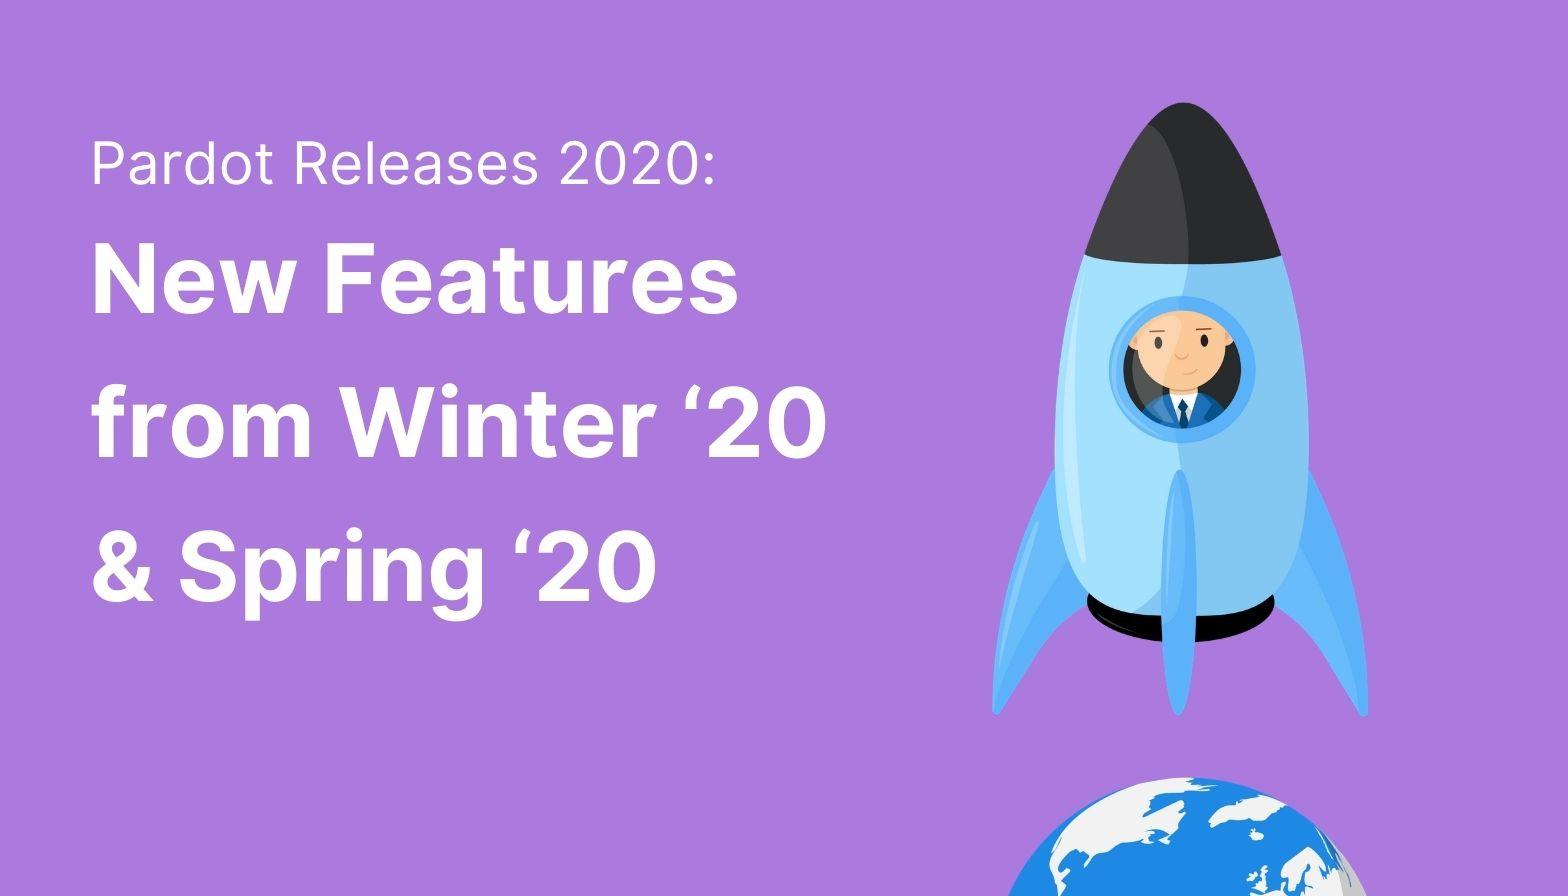 Pardot releases 2020 graphic